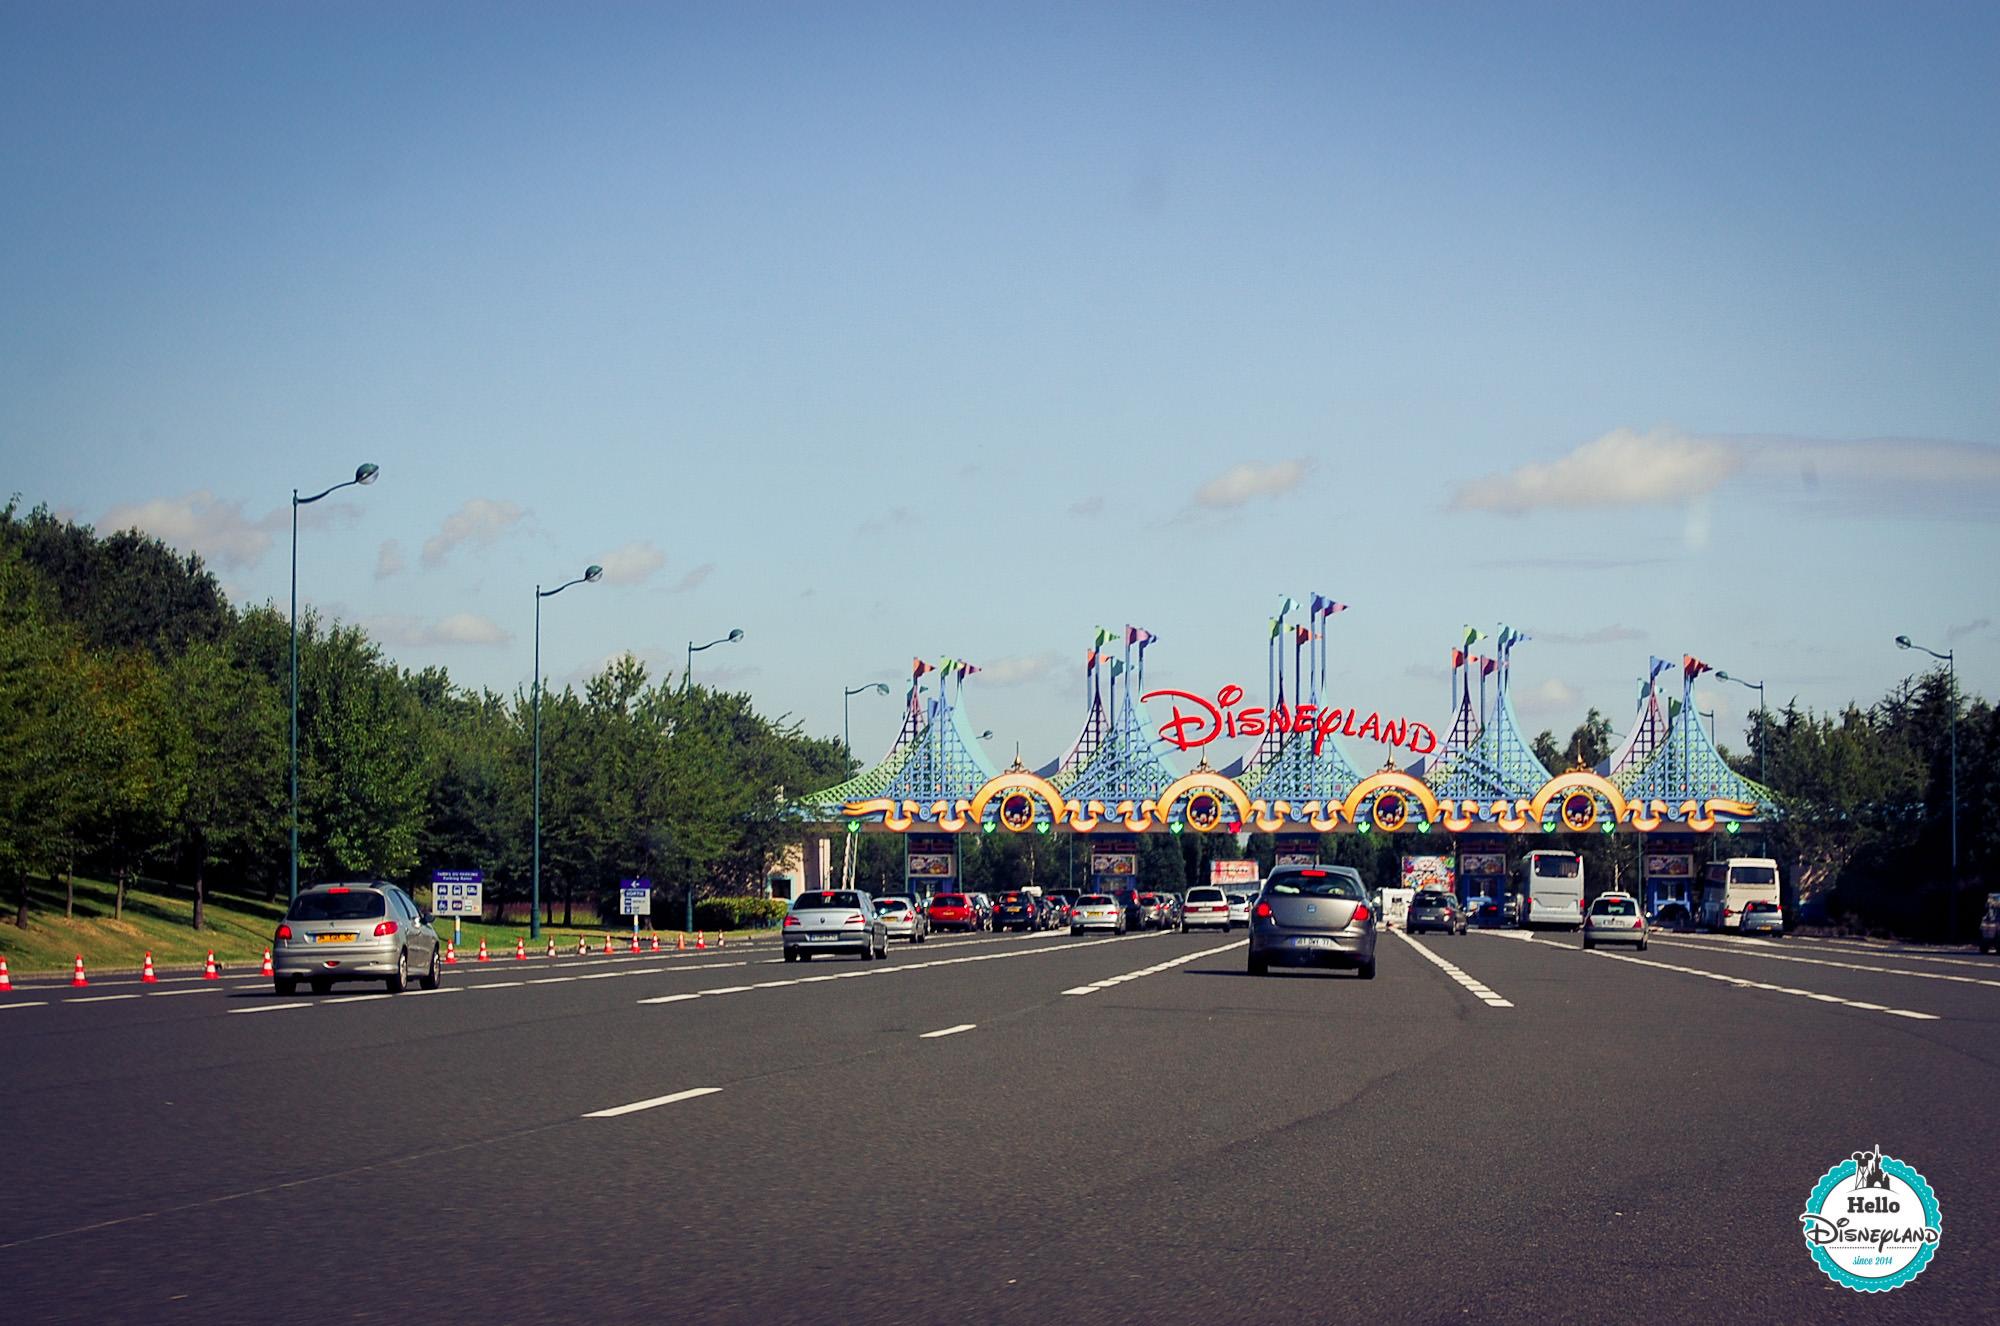 Hello Disneyland Le Blog N 1 Sur Disneyland Paris Parking